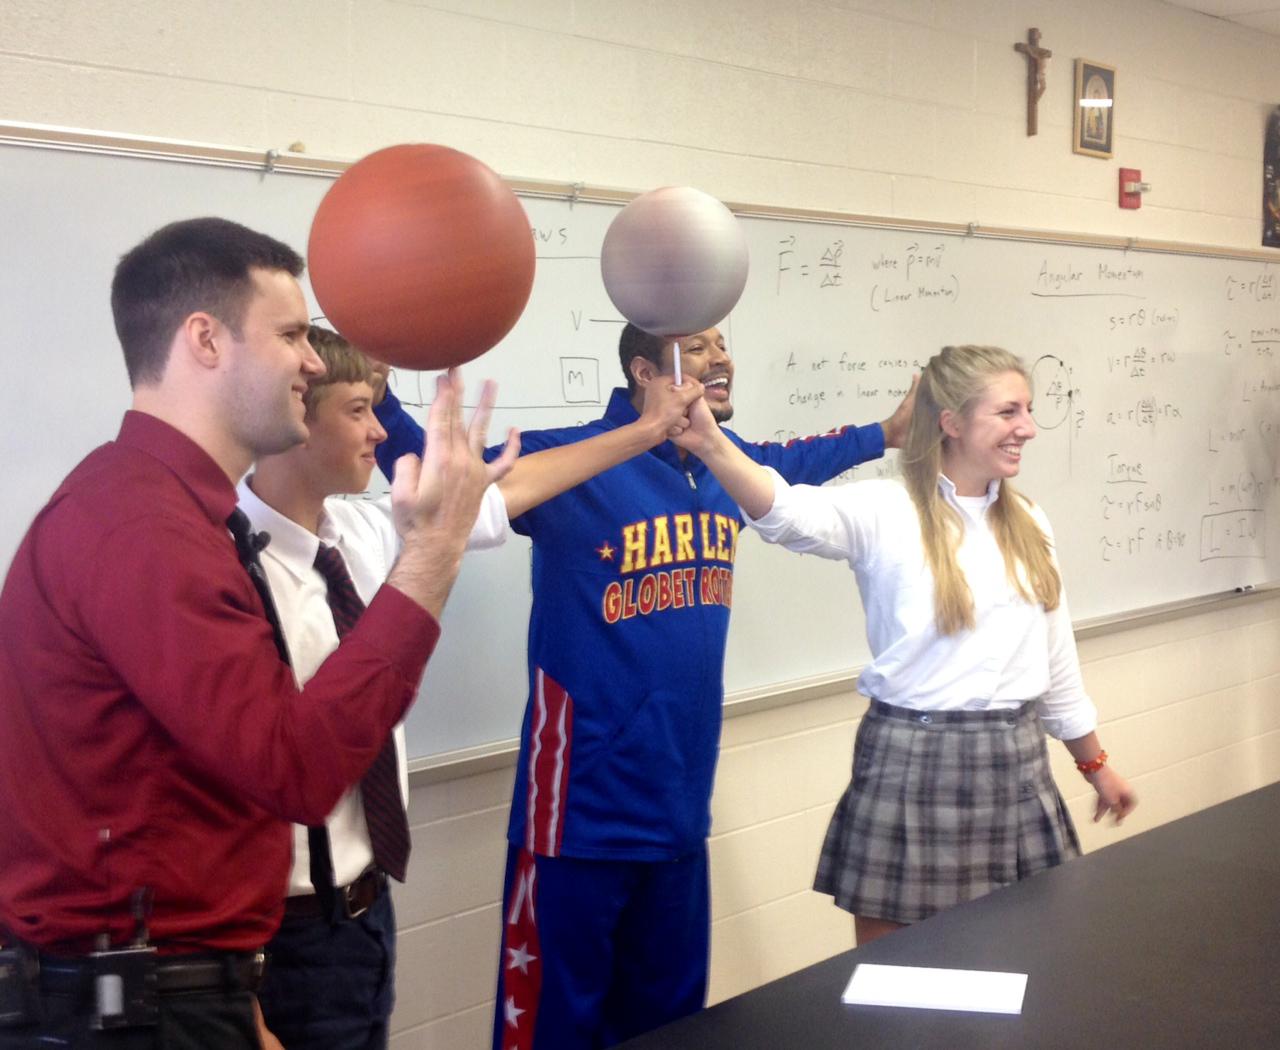 Harlem Globetrotter visits D.C. physics teacher with spin skills